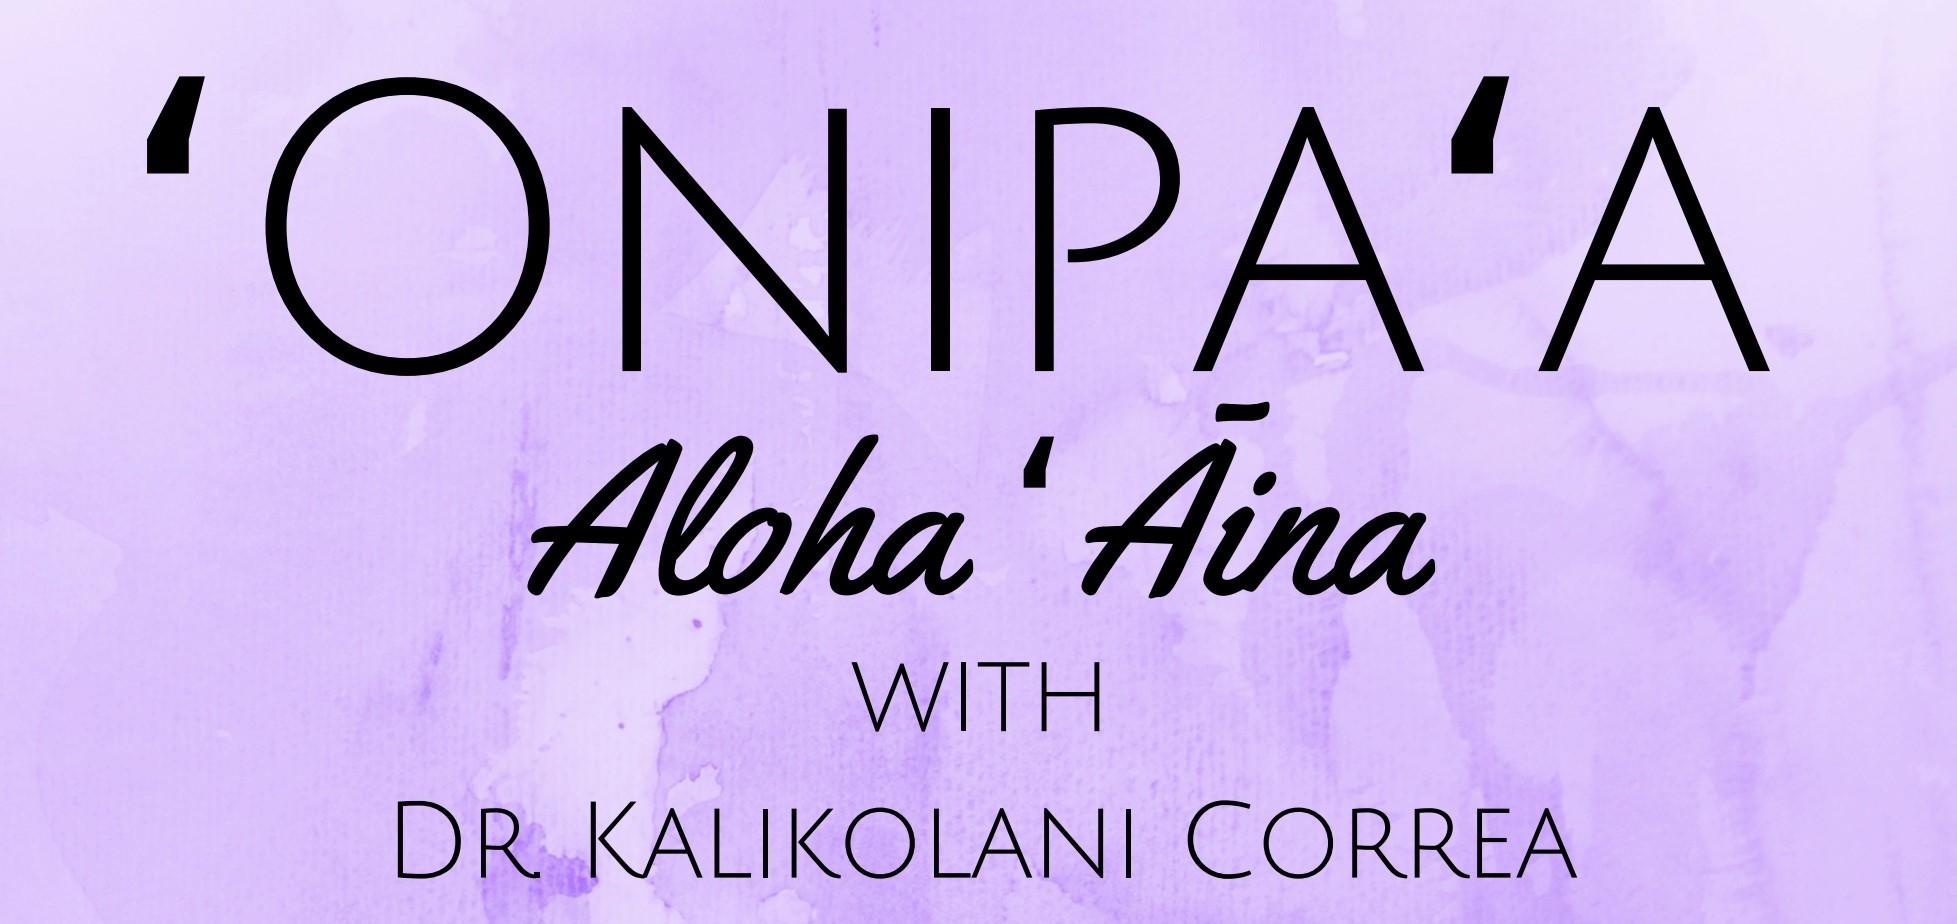 Words Onipaa Aloha Aina with Dr. Kalikolani Correa